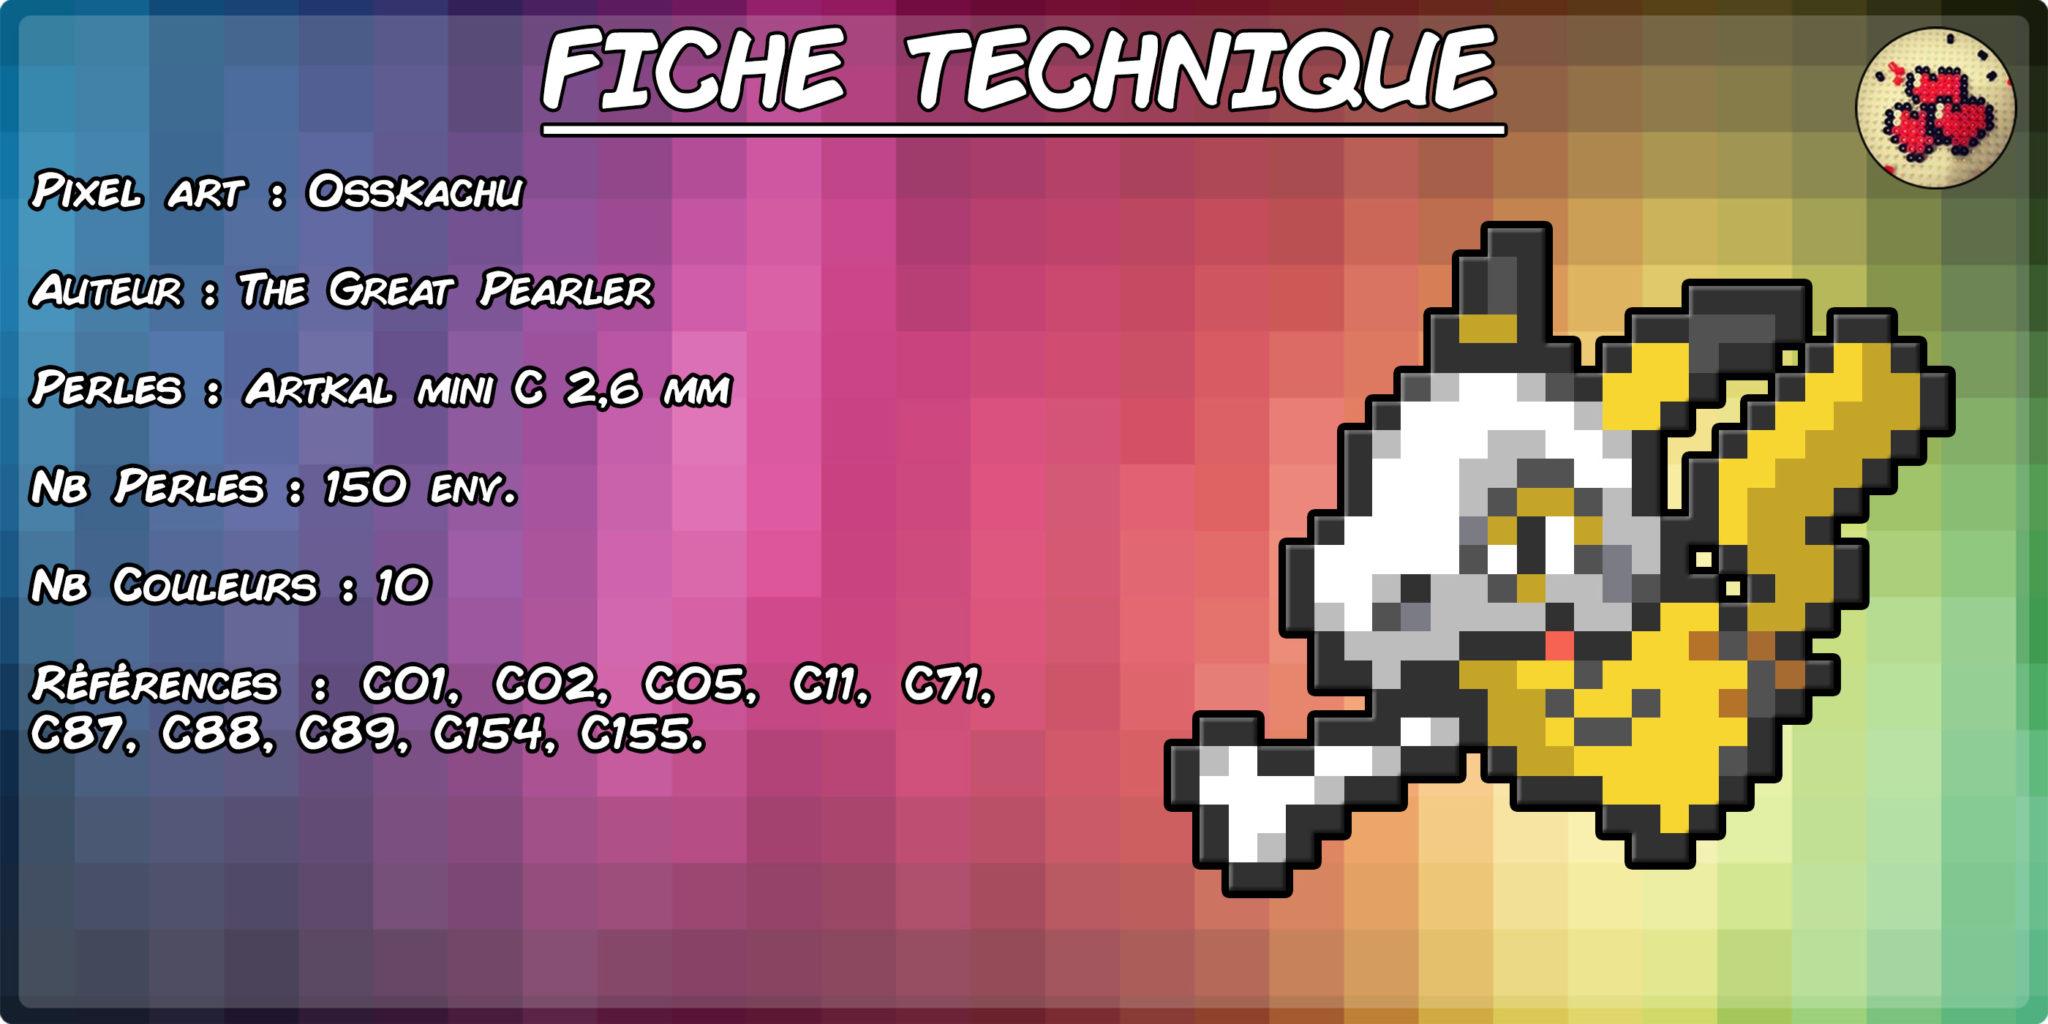 fiche-kyograza-fusion-pokemon-pixel-card-pixelart-pixelcraft-pixelbeads-perlerbeads-perlerart-hama-hamabeads-hamasprites-artkal-artkalbeads-fusebeads-retro-gaming-sprite-design-tutoriel